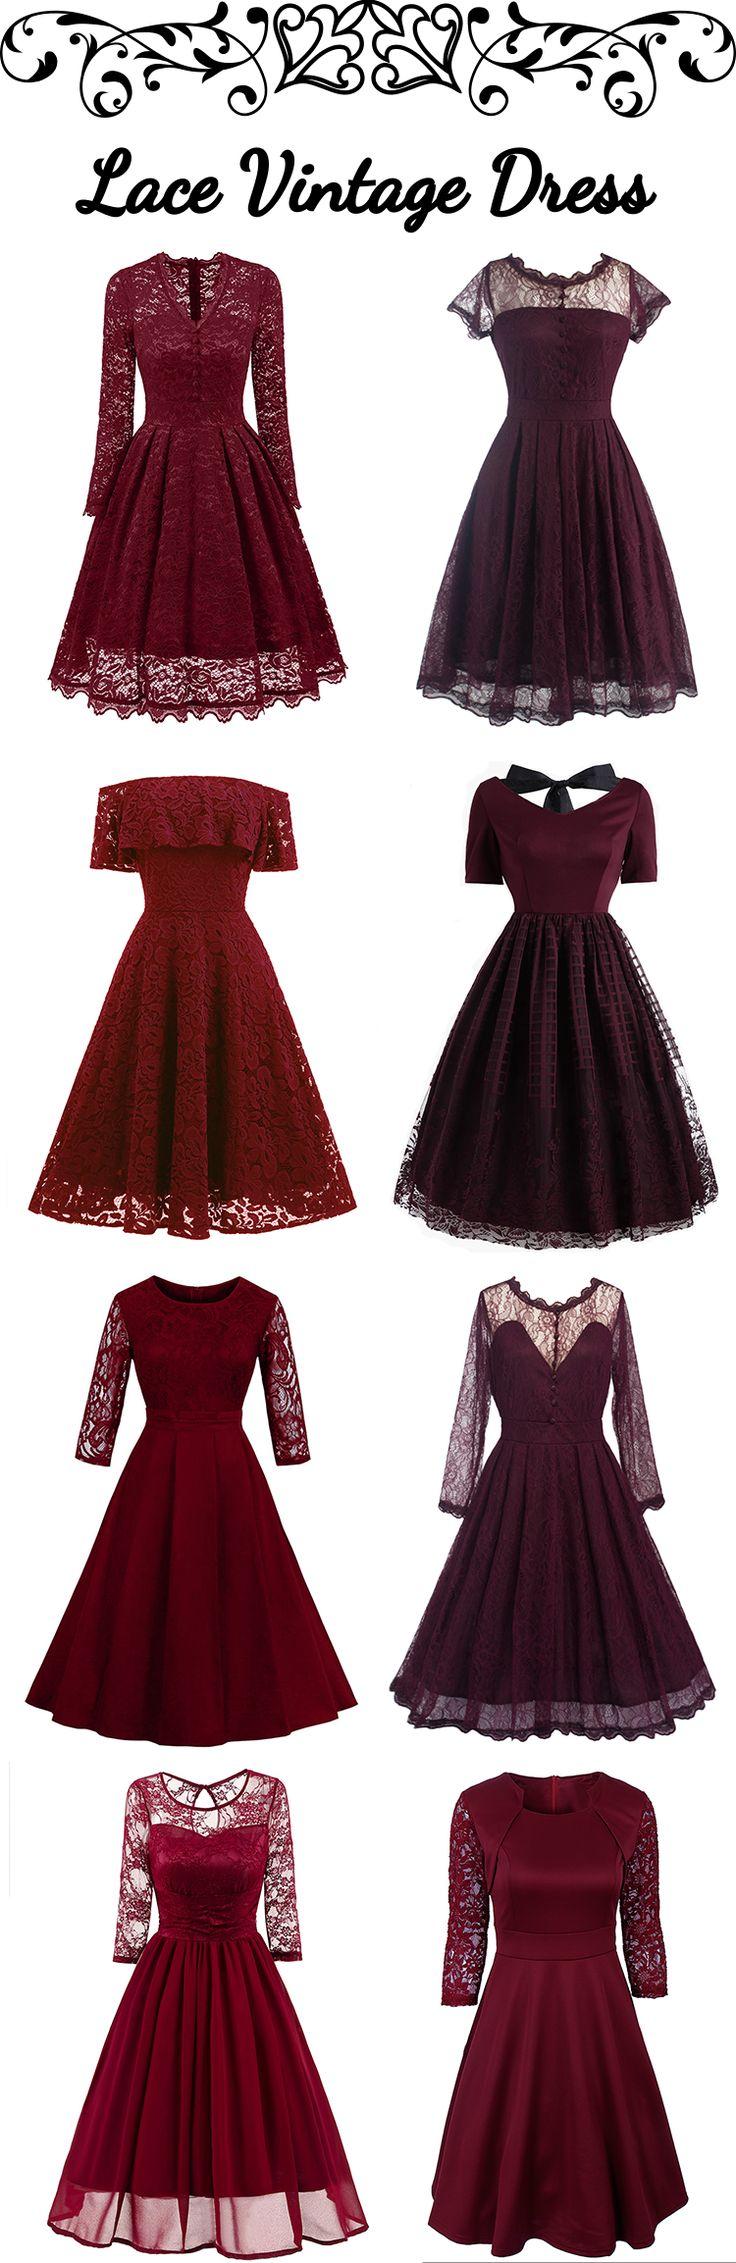 100+ Lace Vintage Dresses | Low to $2.99 | #bottomprice #vintage #Dress